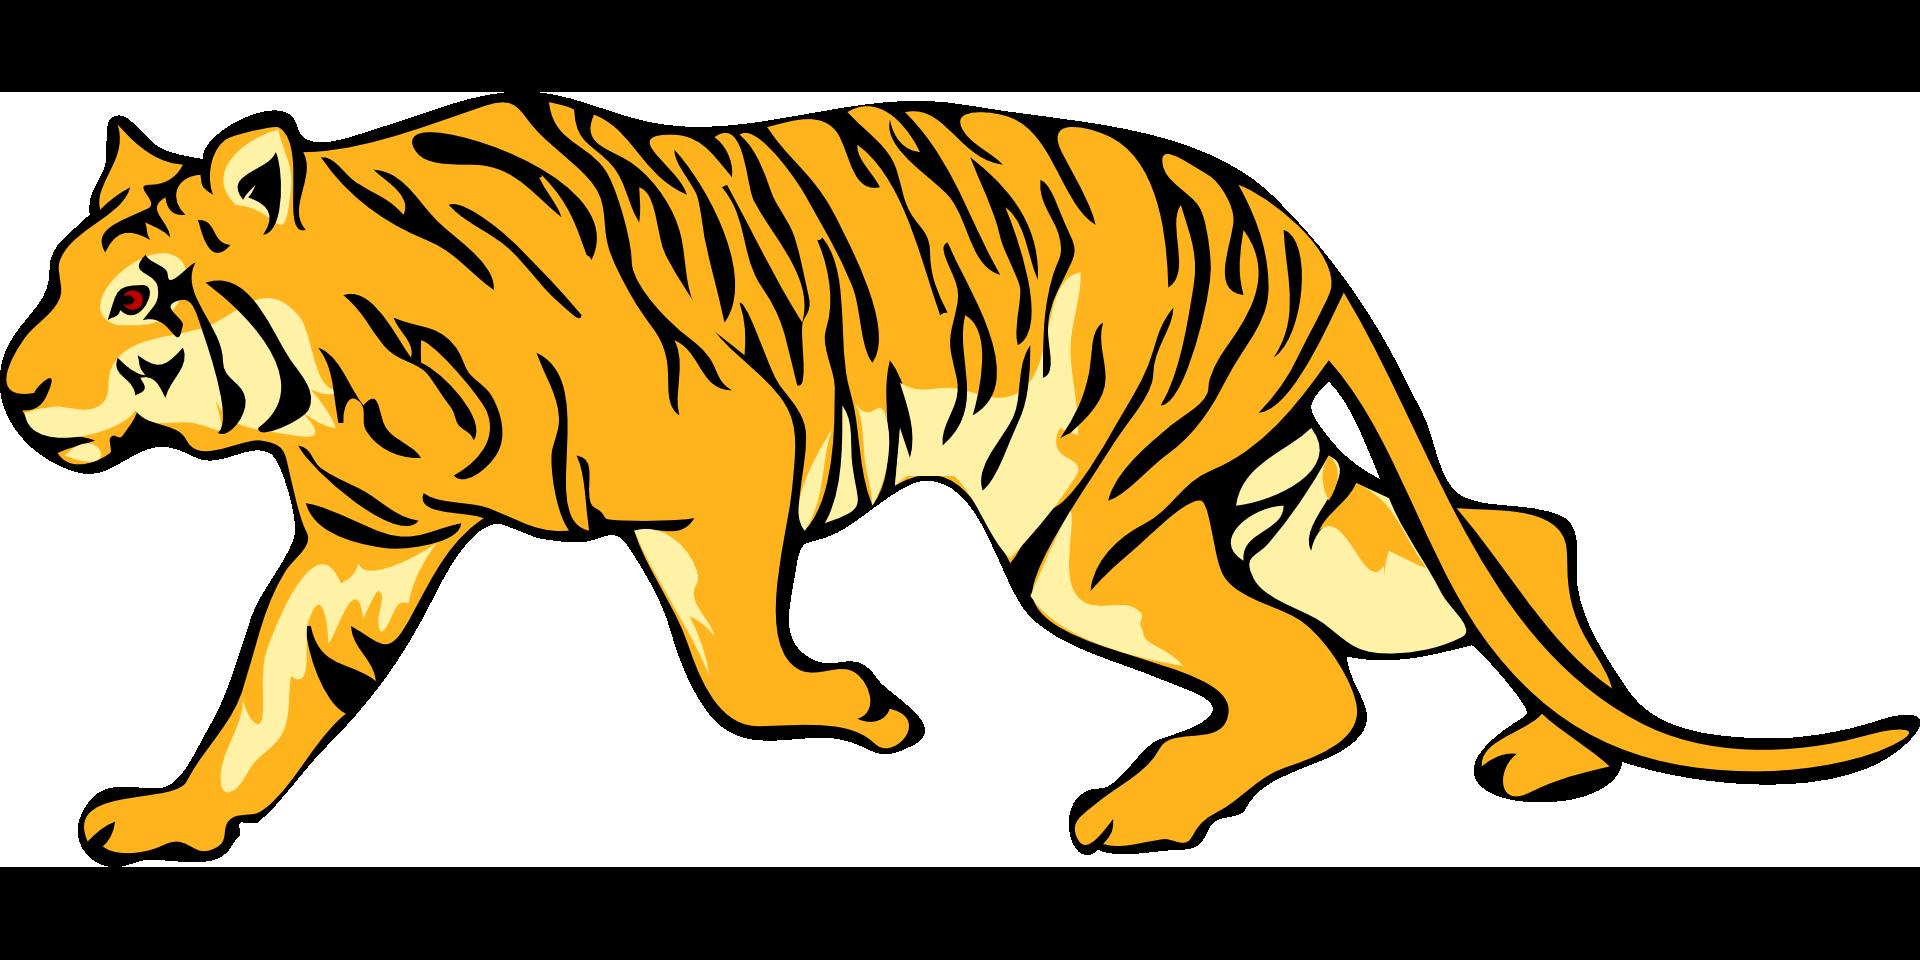 Clipart tiger student, Clipart tiger student Transparent.